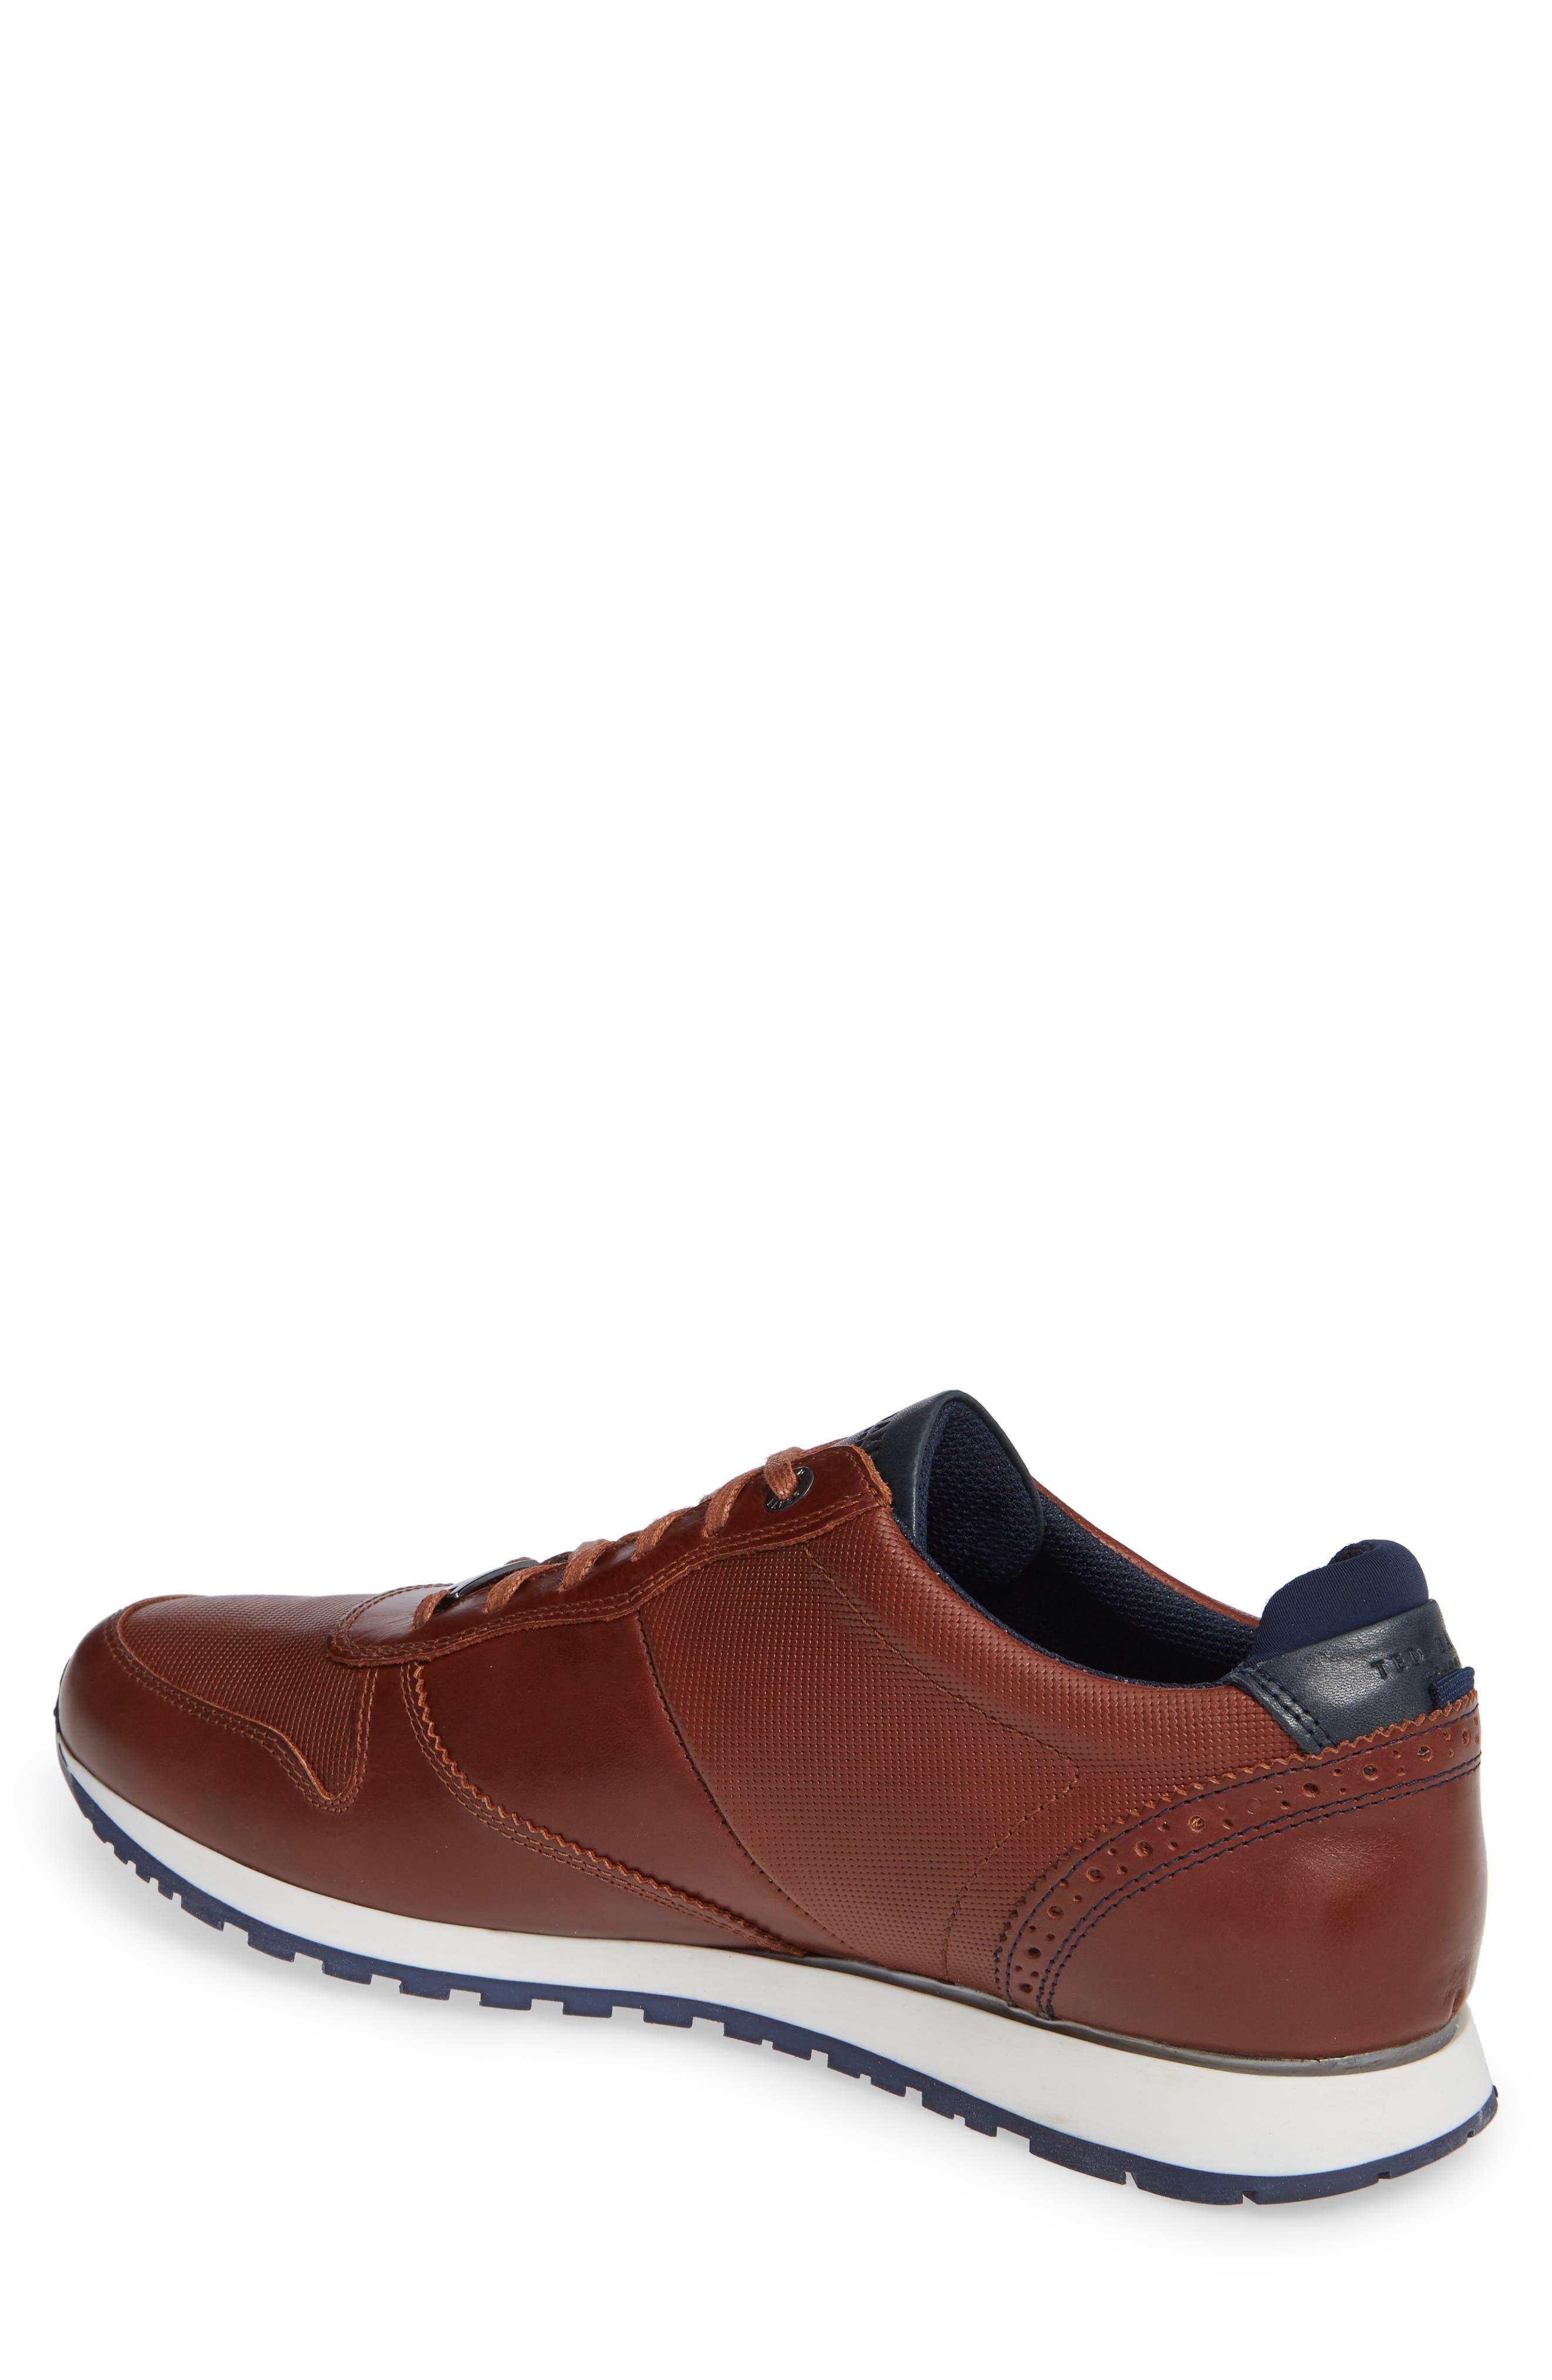 Shindl Sneaker,                             Alternate thumbnail 10, color,